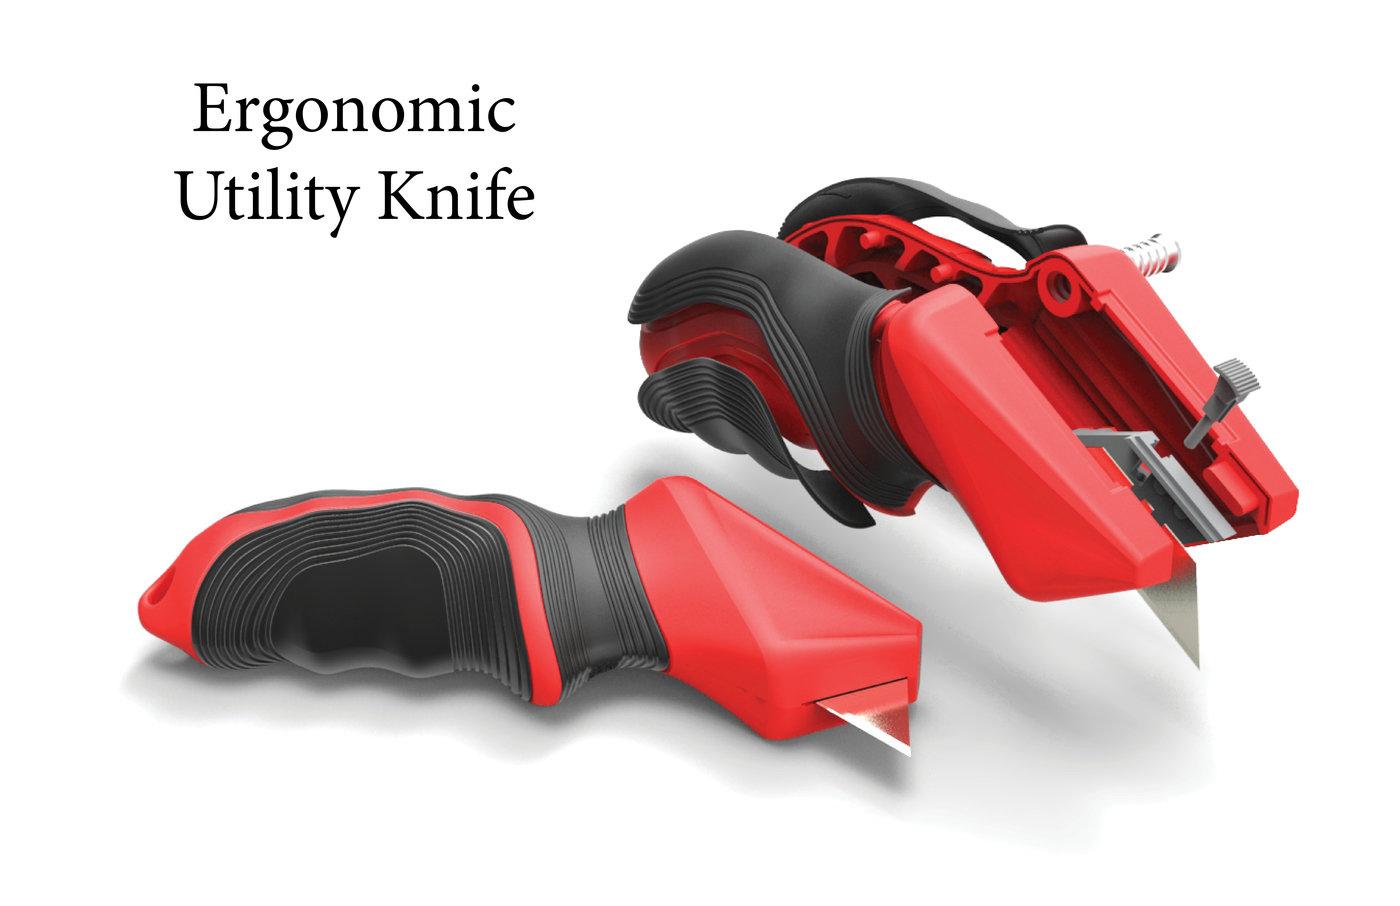 Ergonomic Utility Knife By Evan Lembke At Coroflot Com